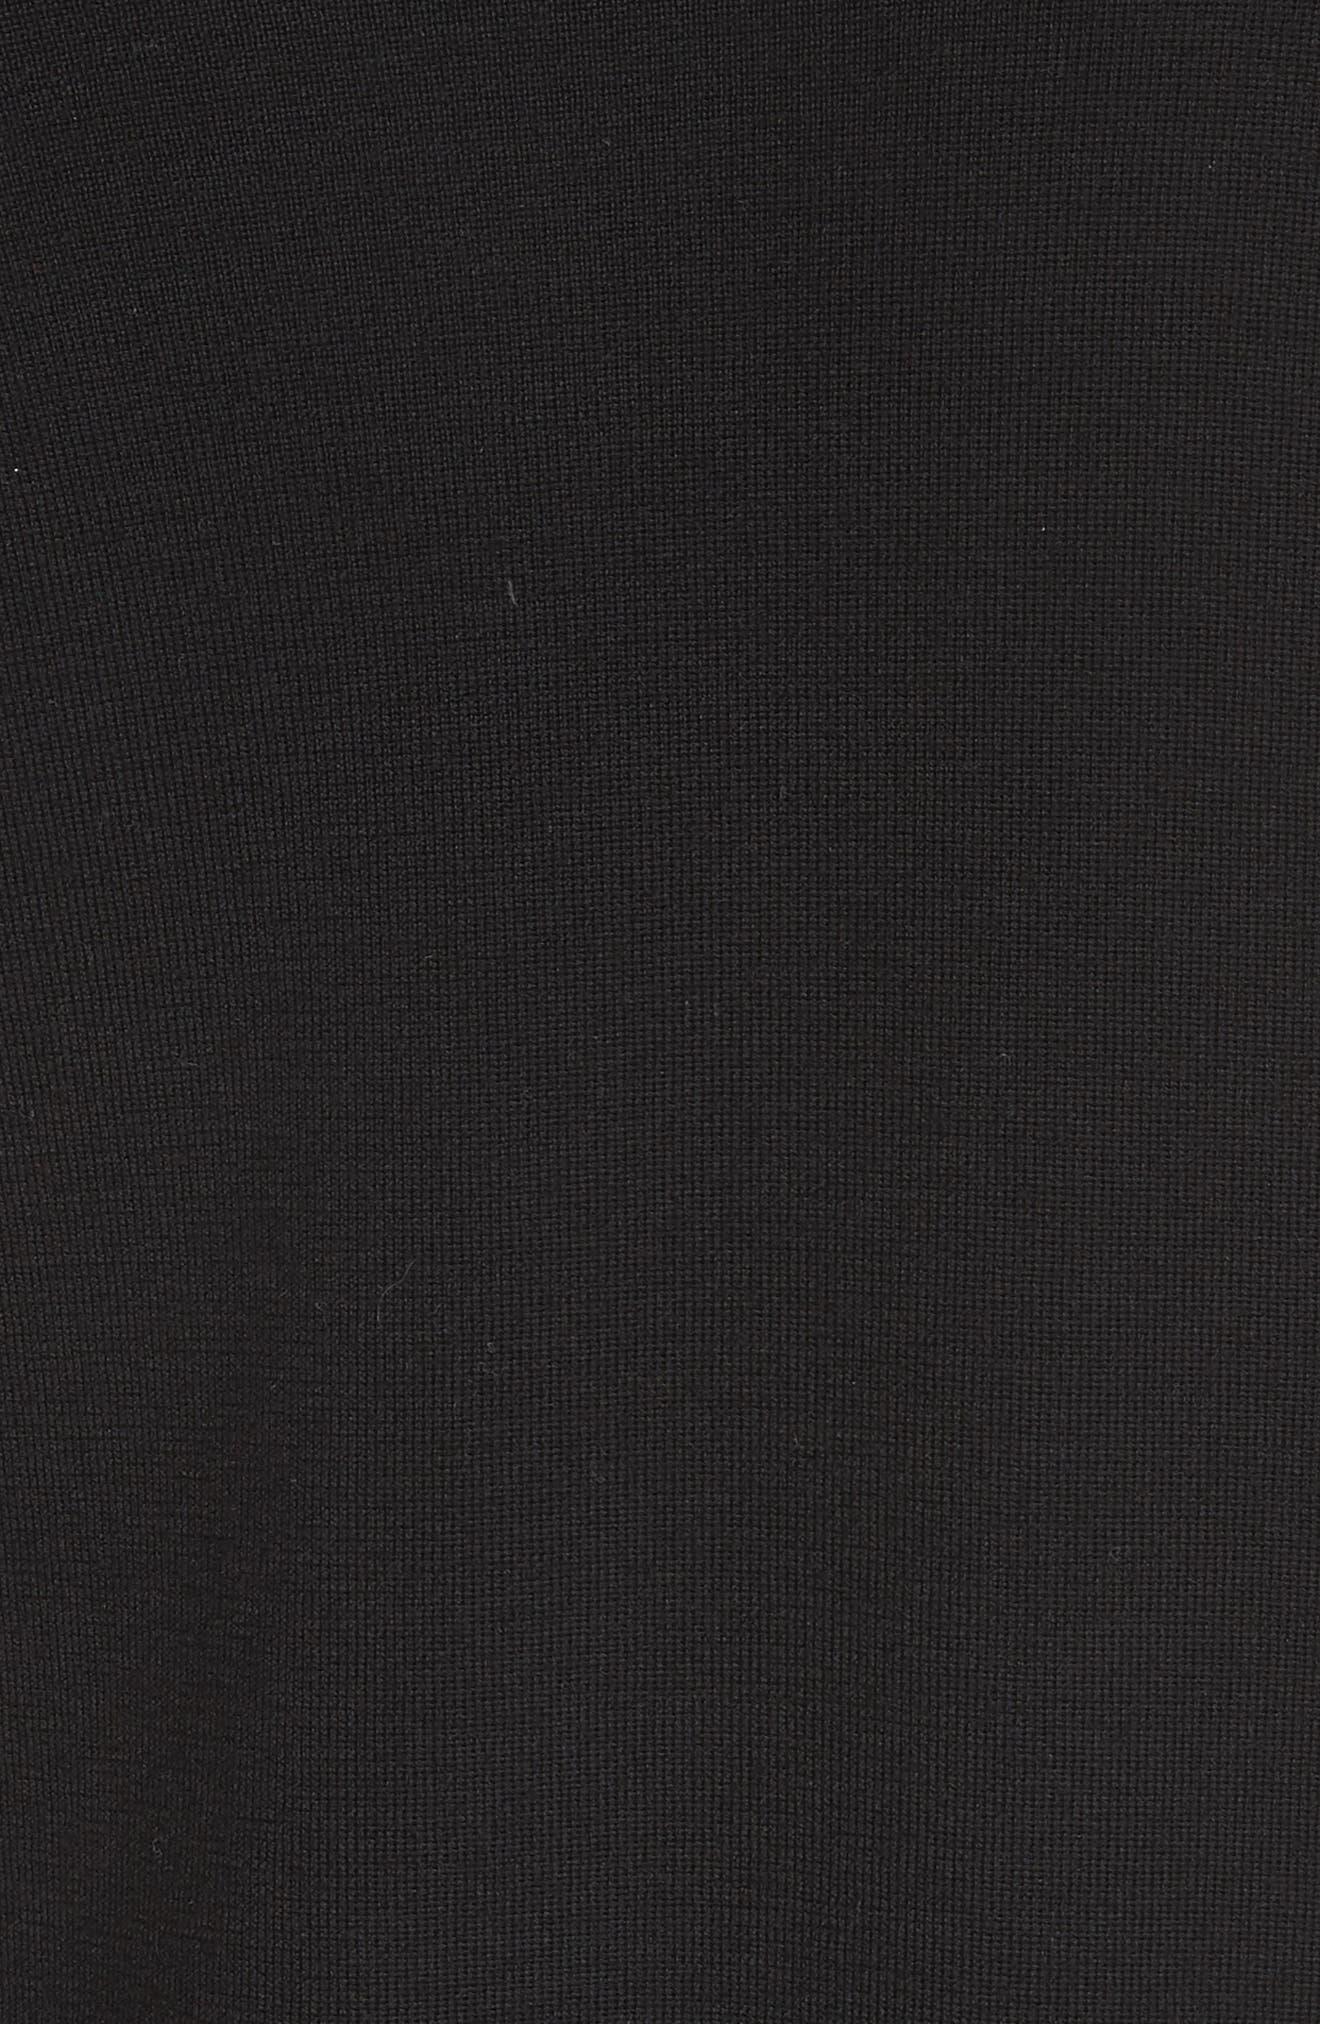 Draped Wool Knit Cardigan,                             Alternate thumbnail 6, color,                             Black